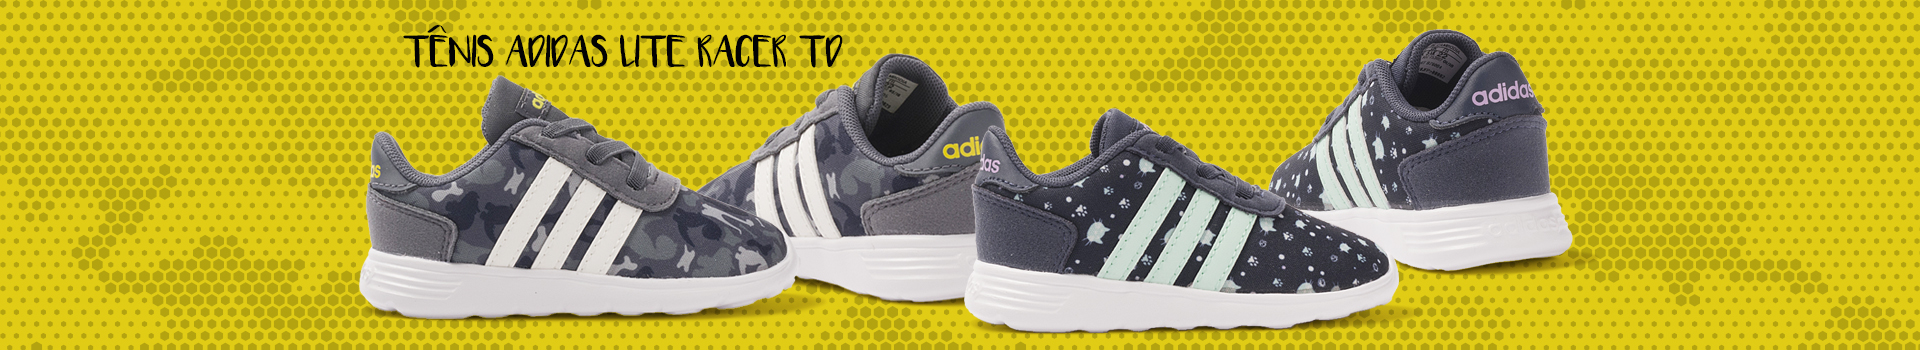 tvdesk_p4-09_11_18-adidas_Lite